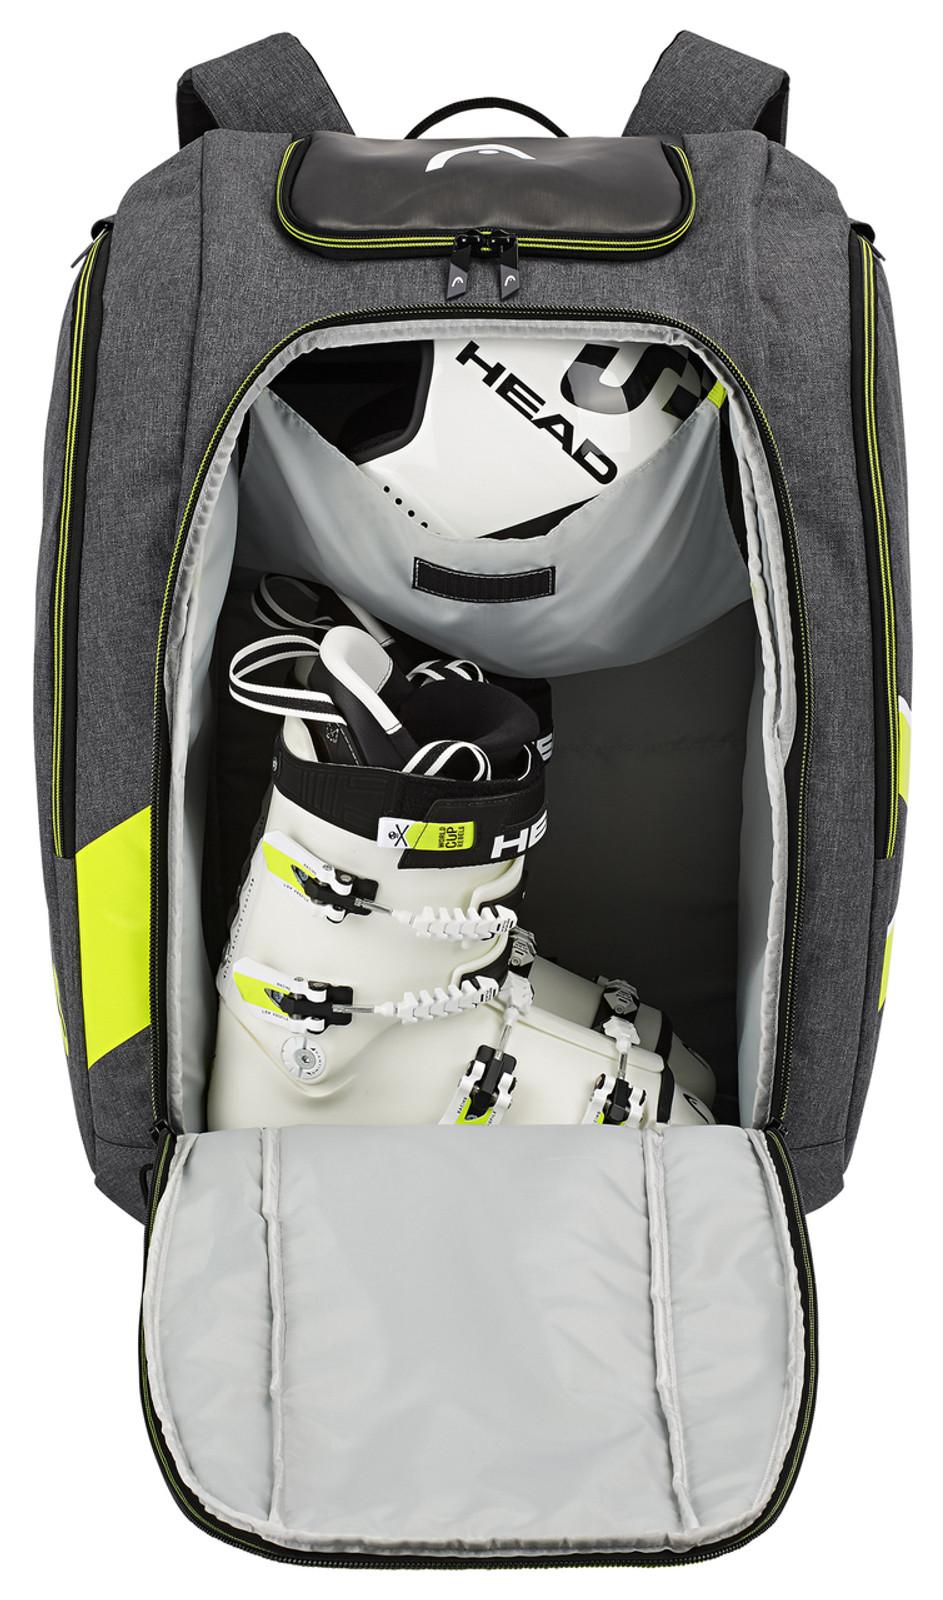 2018 Head Rebels Racing Backpack - Small